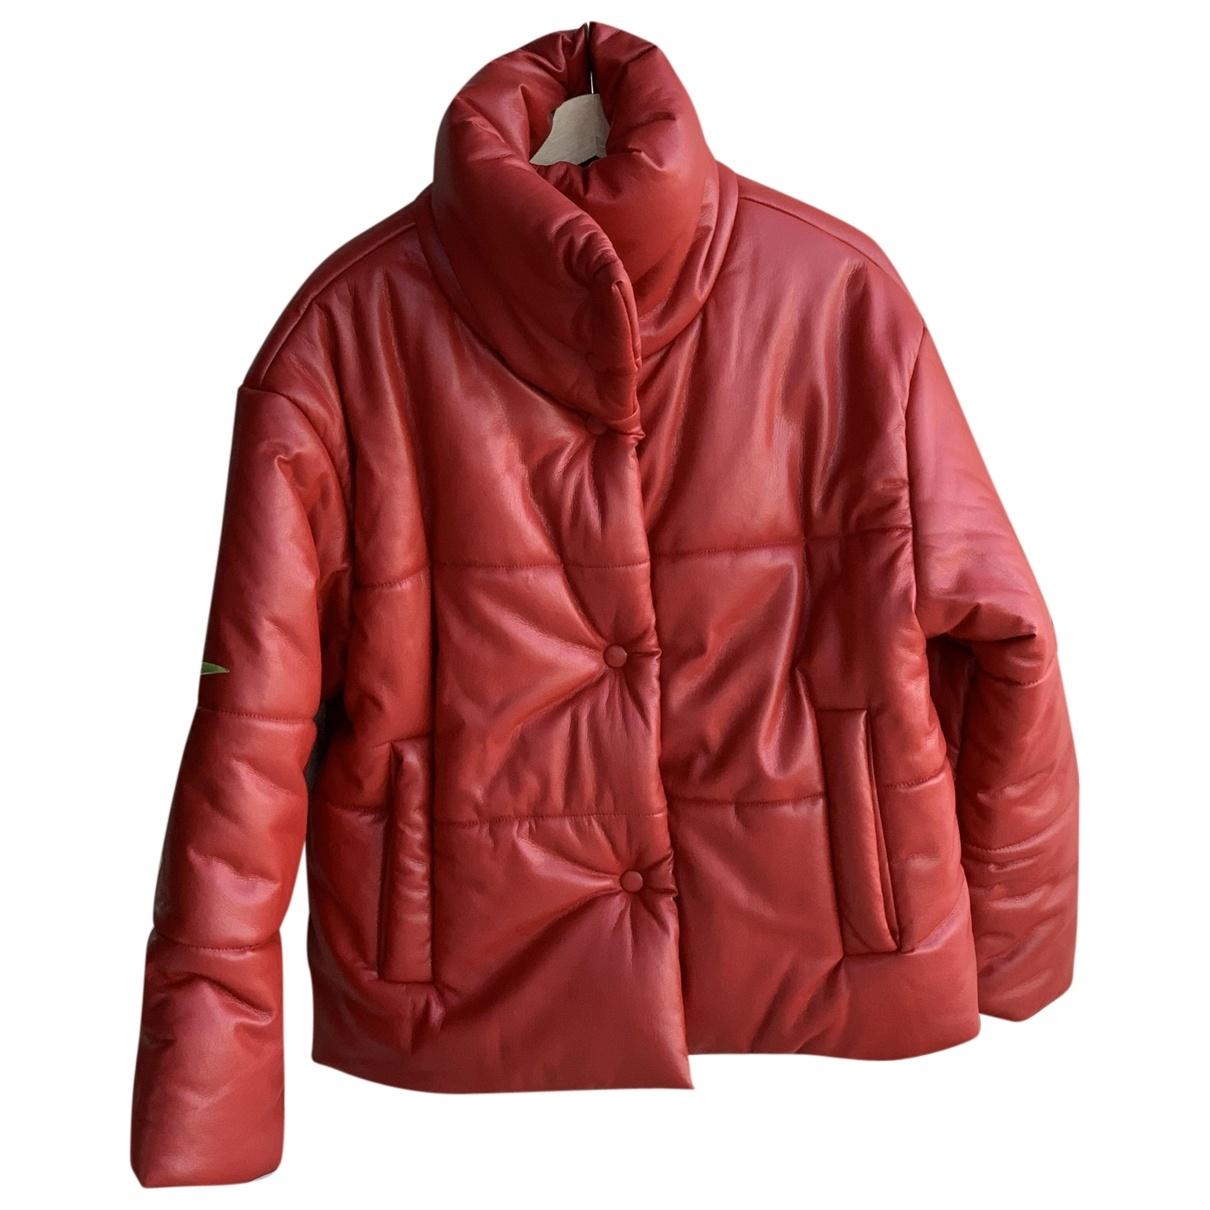 Nanushka \N Red Leather coat for Women S International